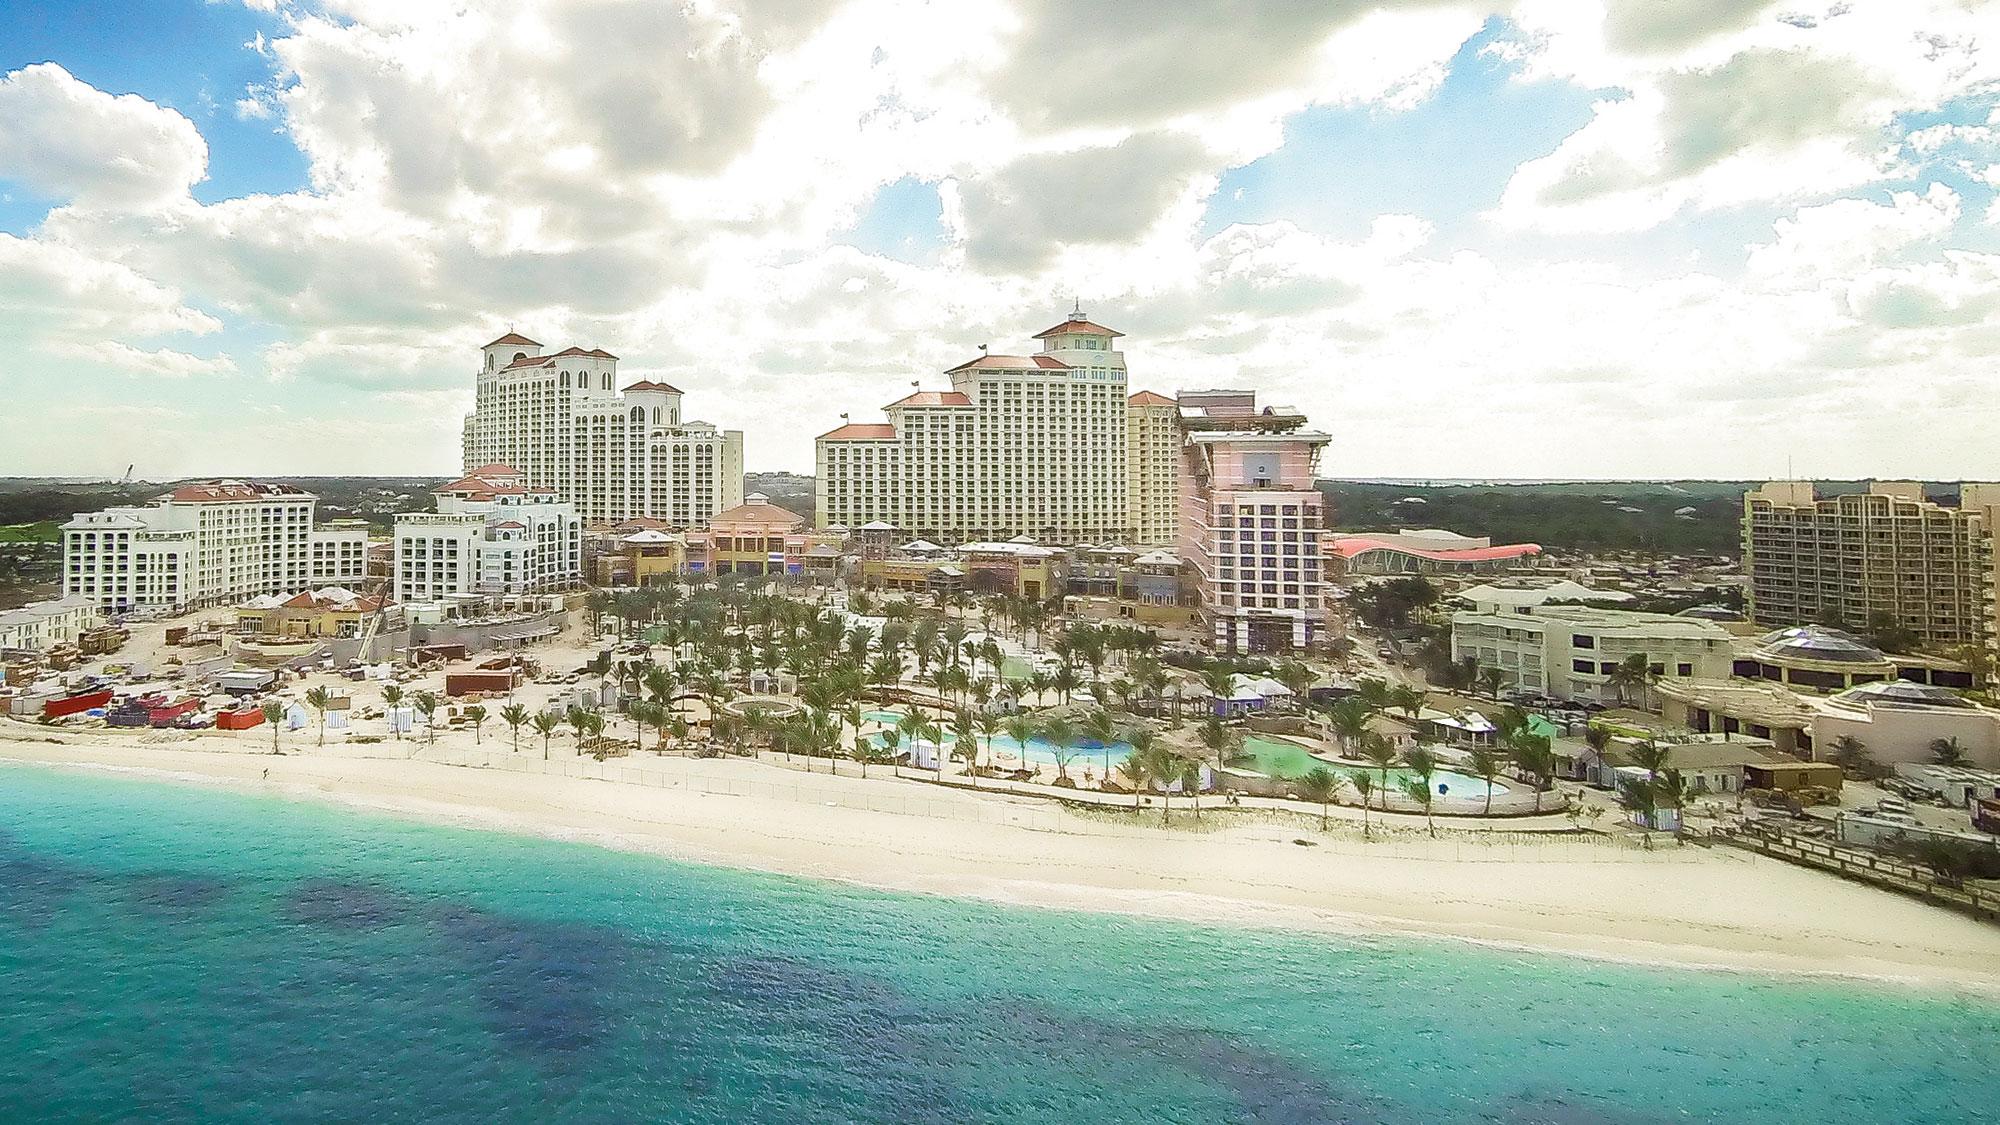 baha mar casino & hotel news